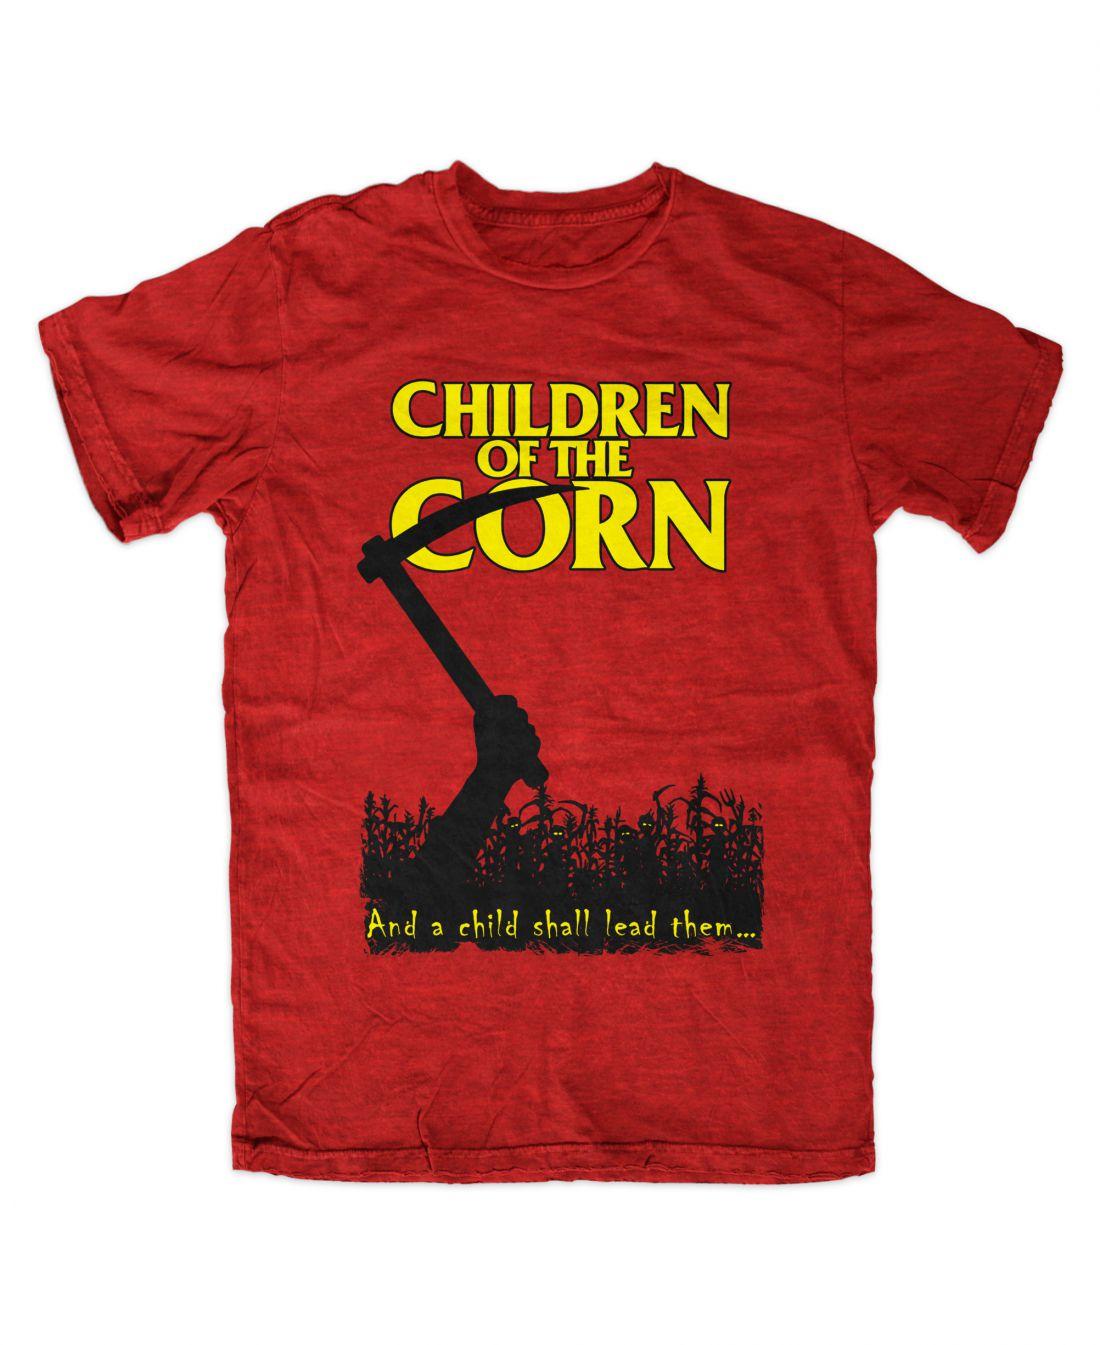 Children Of The Corn (antique red póló)